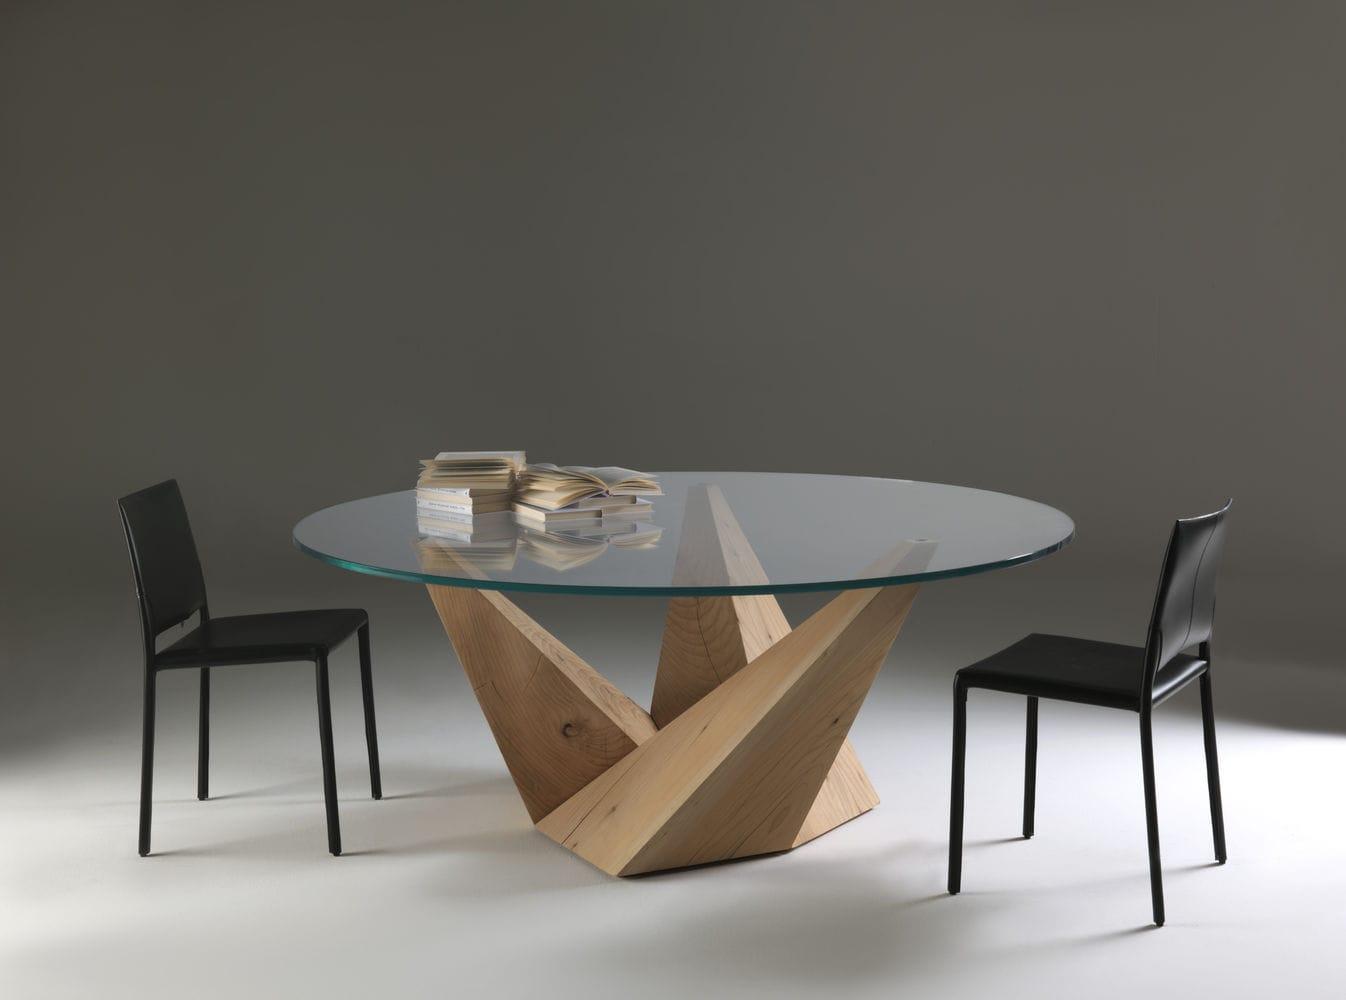 mesa de diseo original de vidrio de madera maciza de cedro peak riva